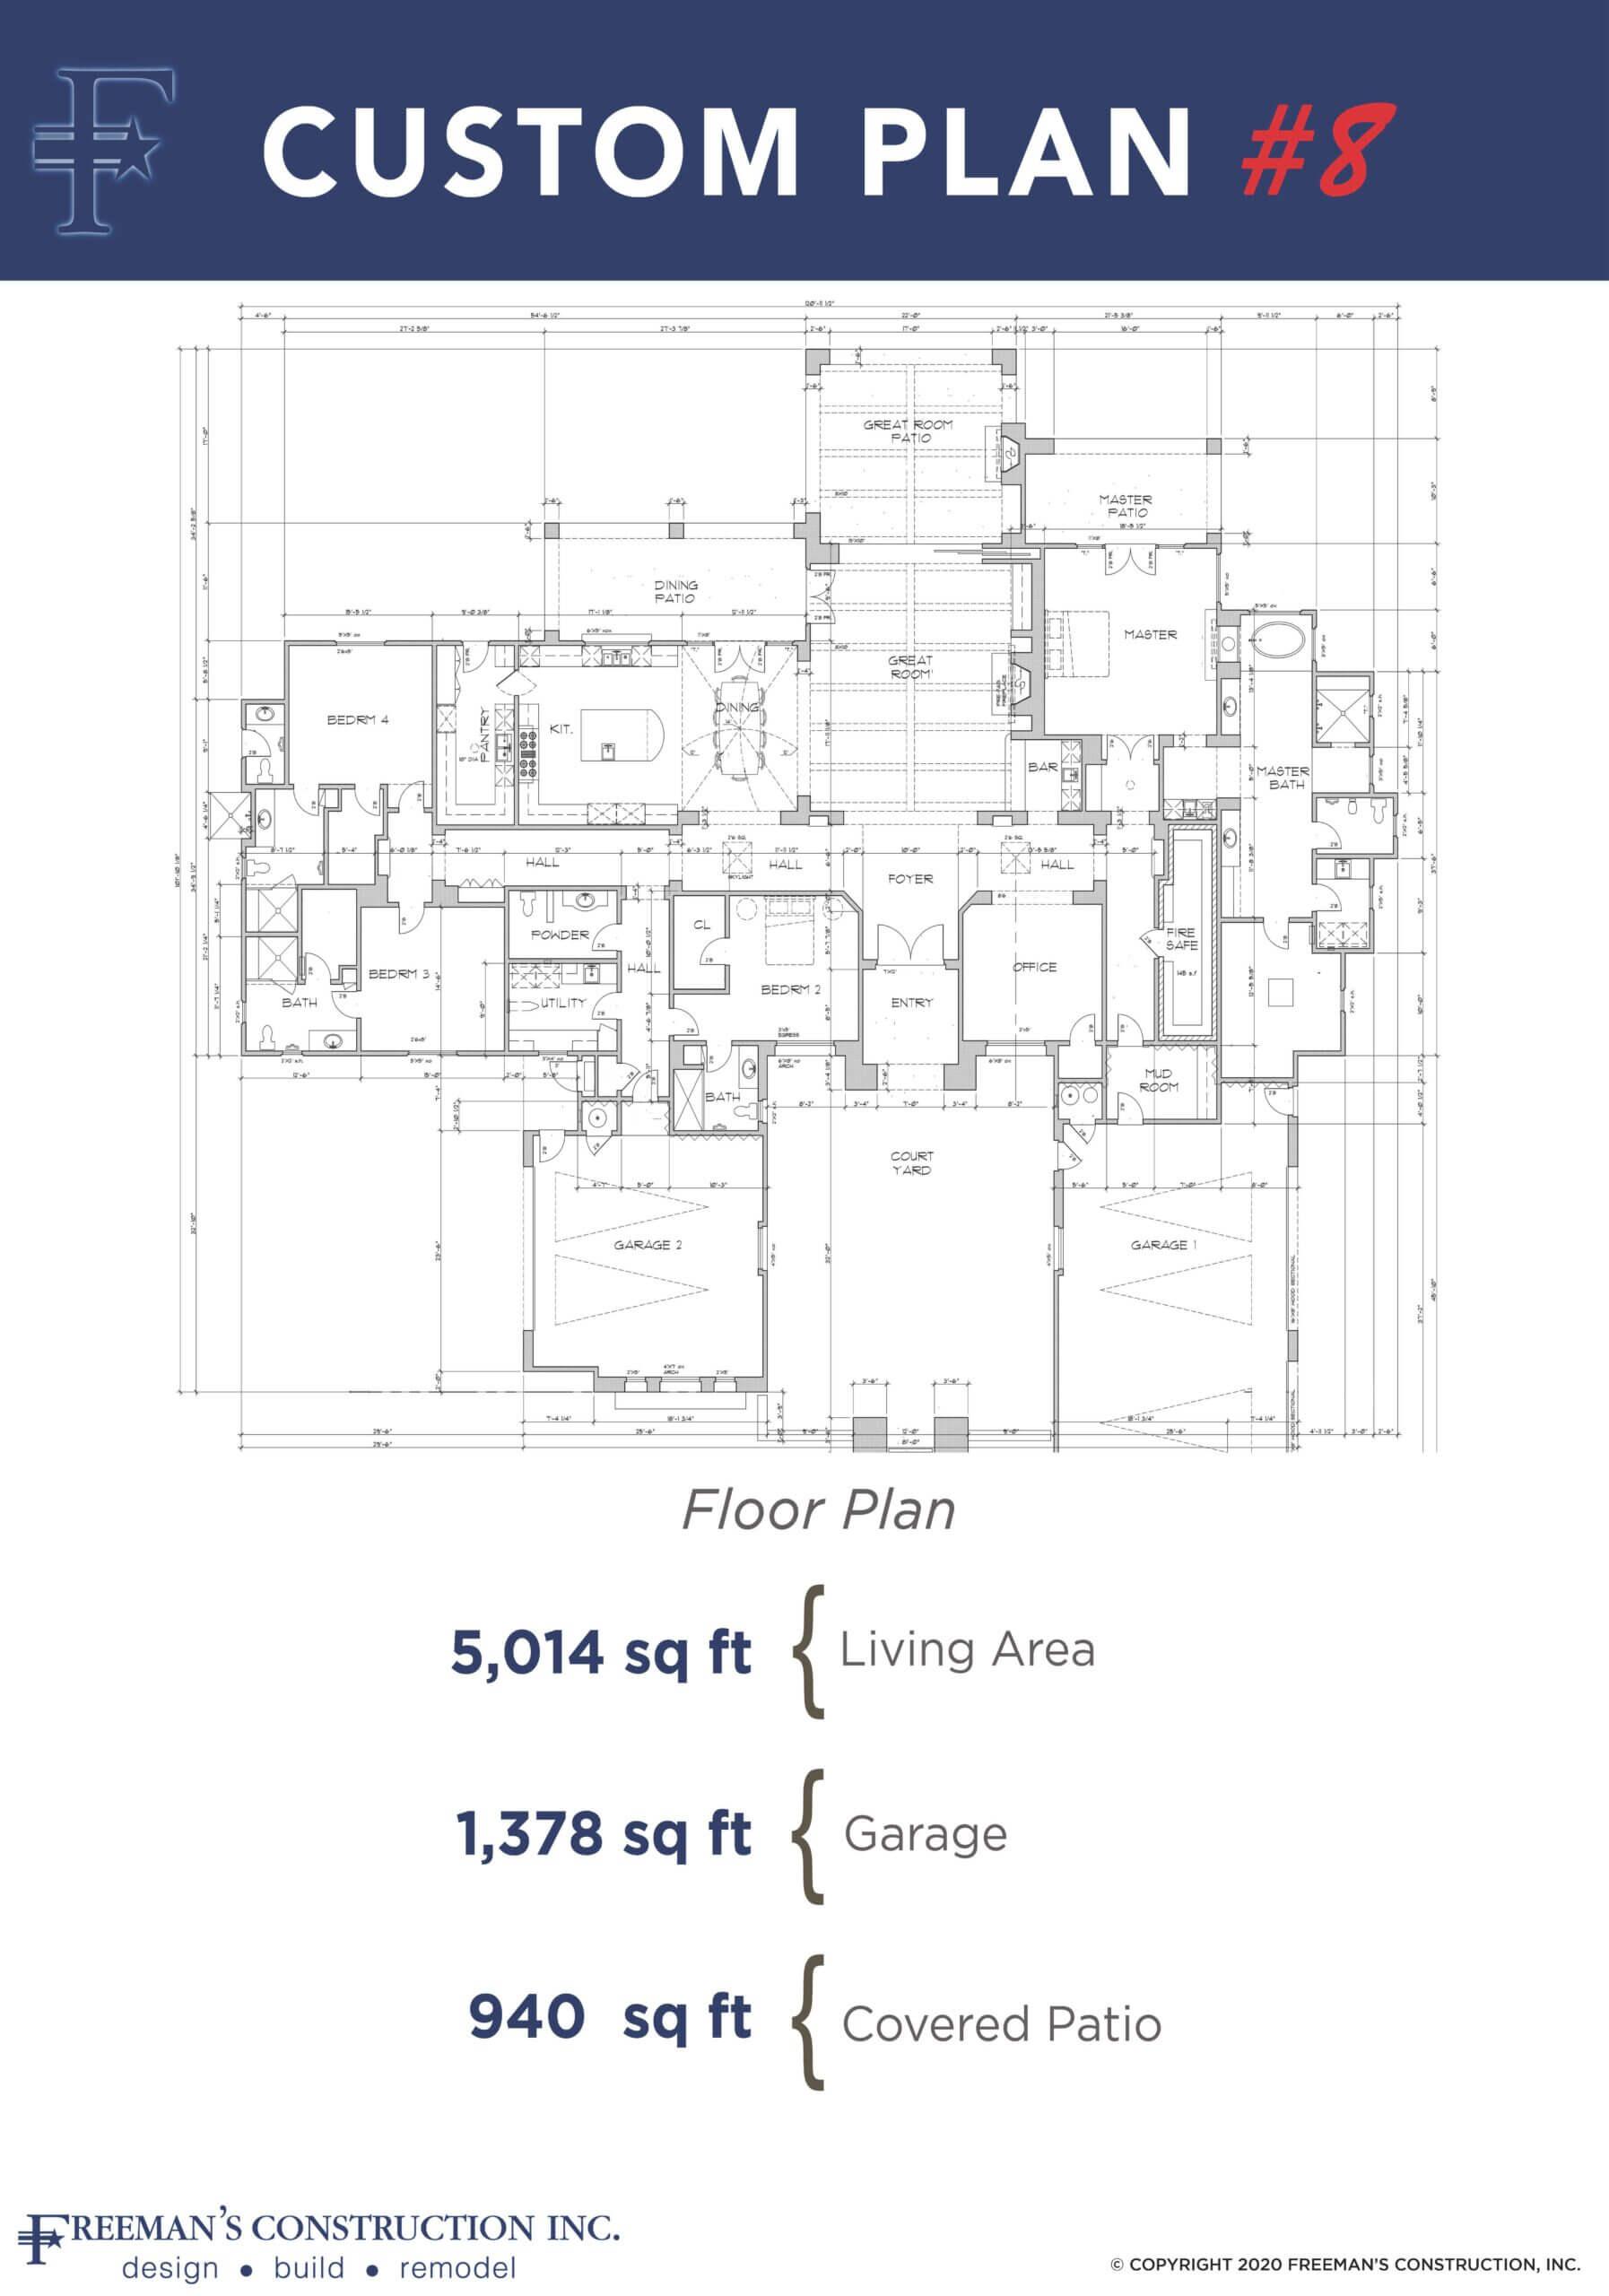 custom-home-floor-plan-8-in-san-diego-county-ca-by-freemans-construction-inc